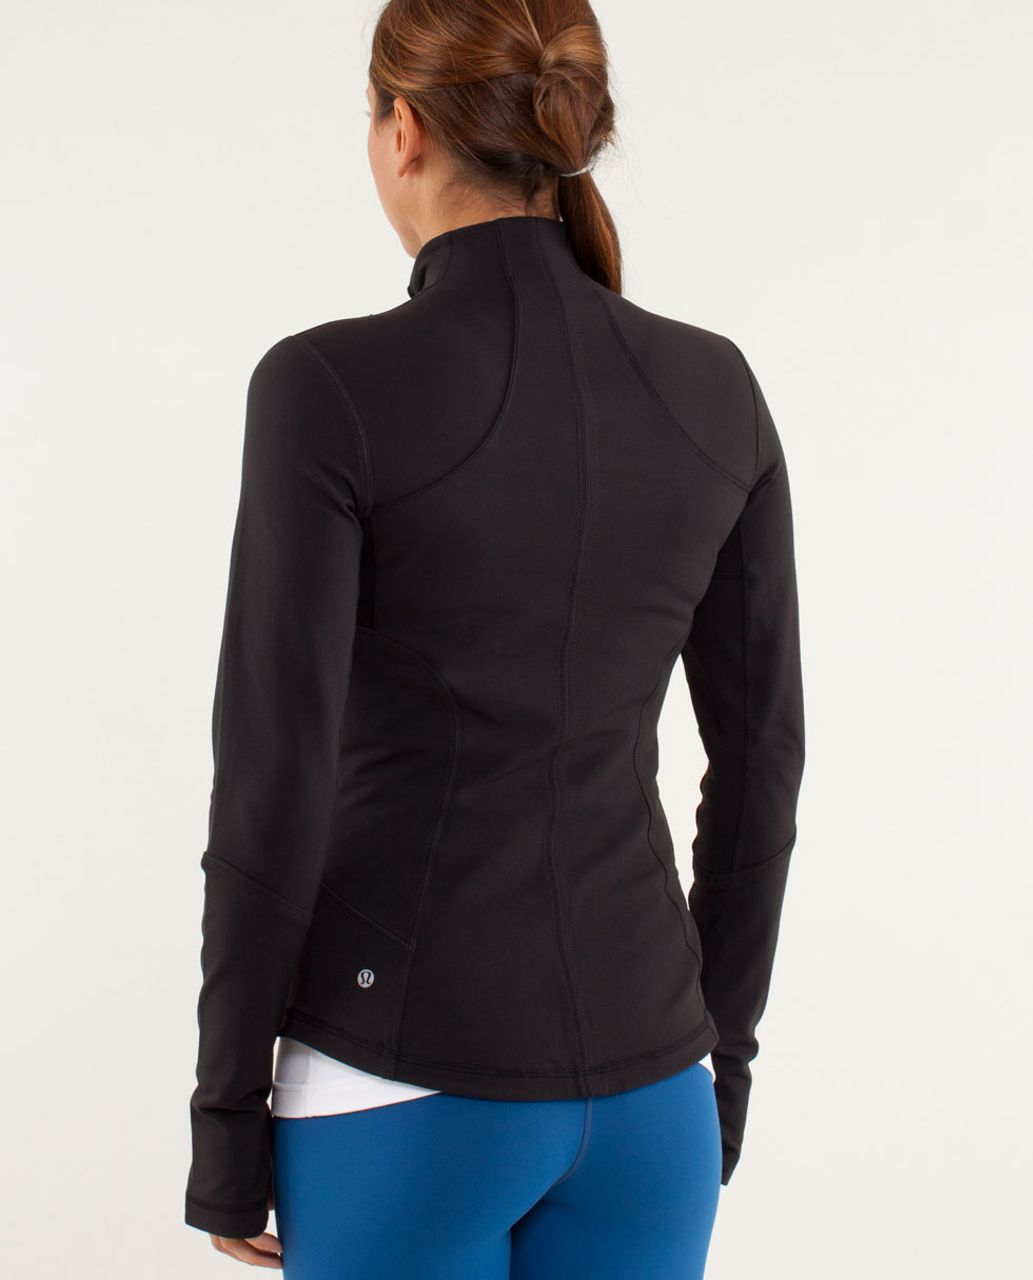 Lululemon Forme Jacket *Brushed - Black